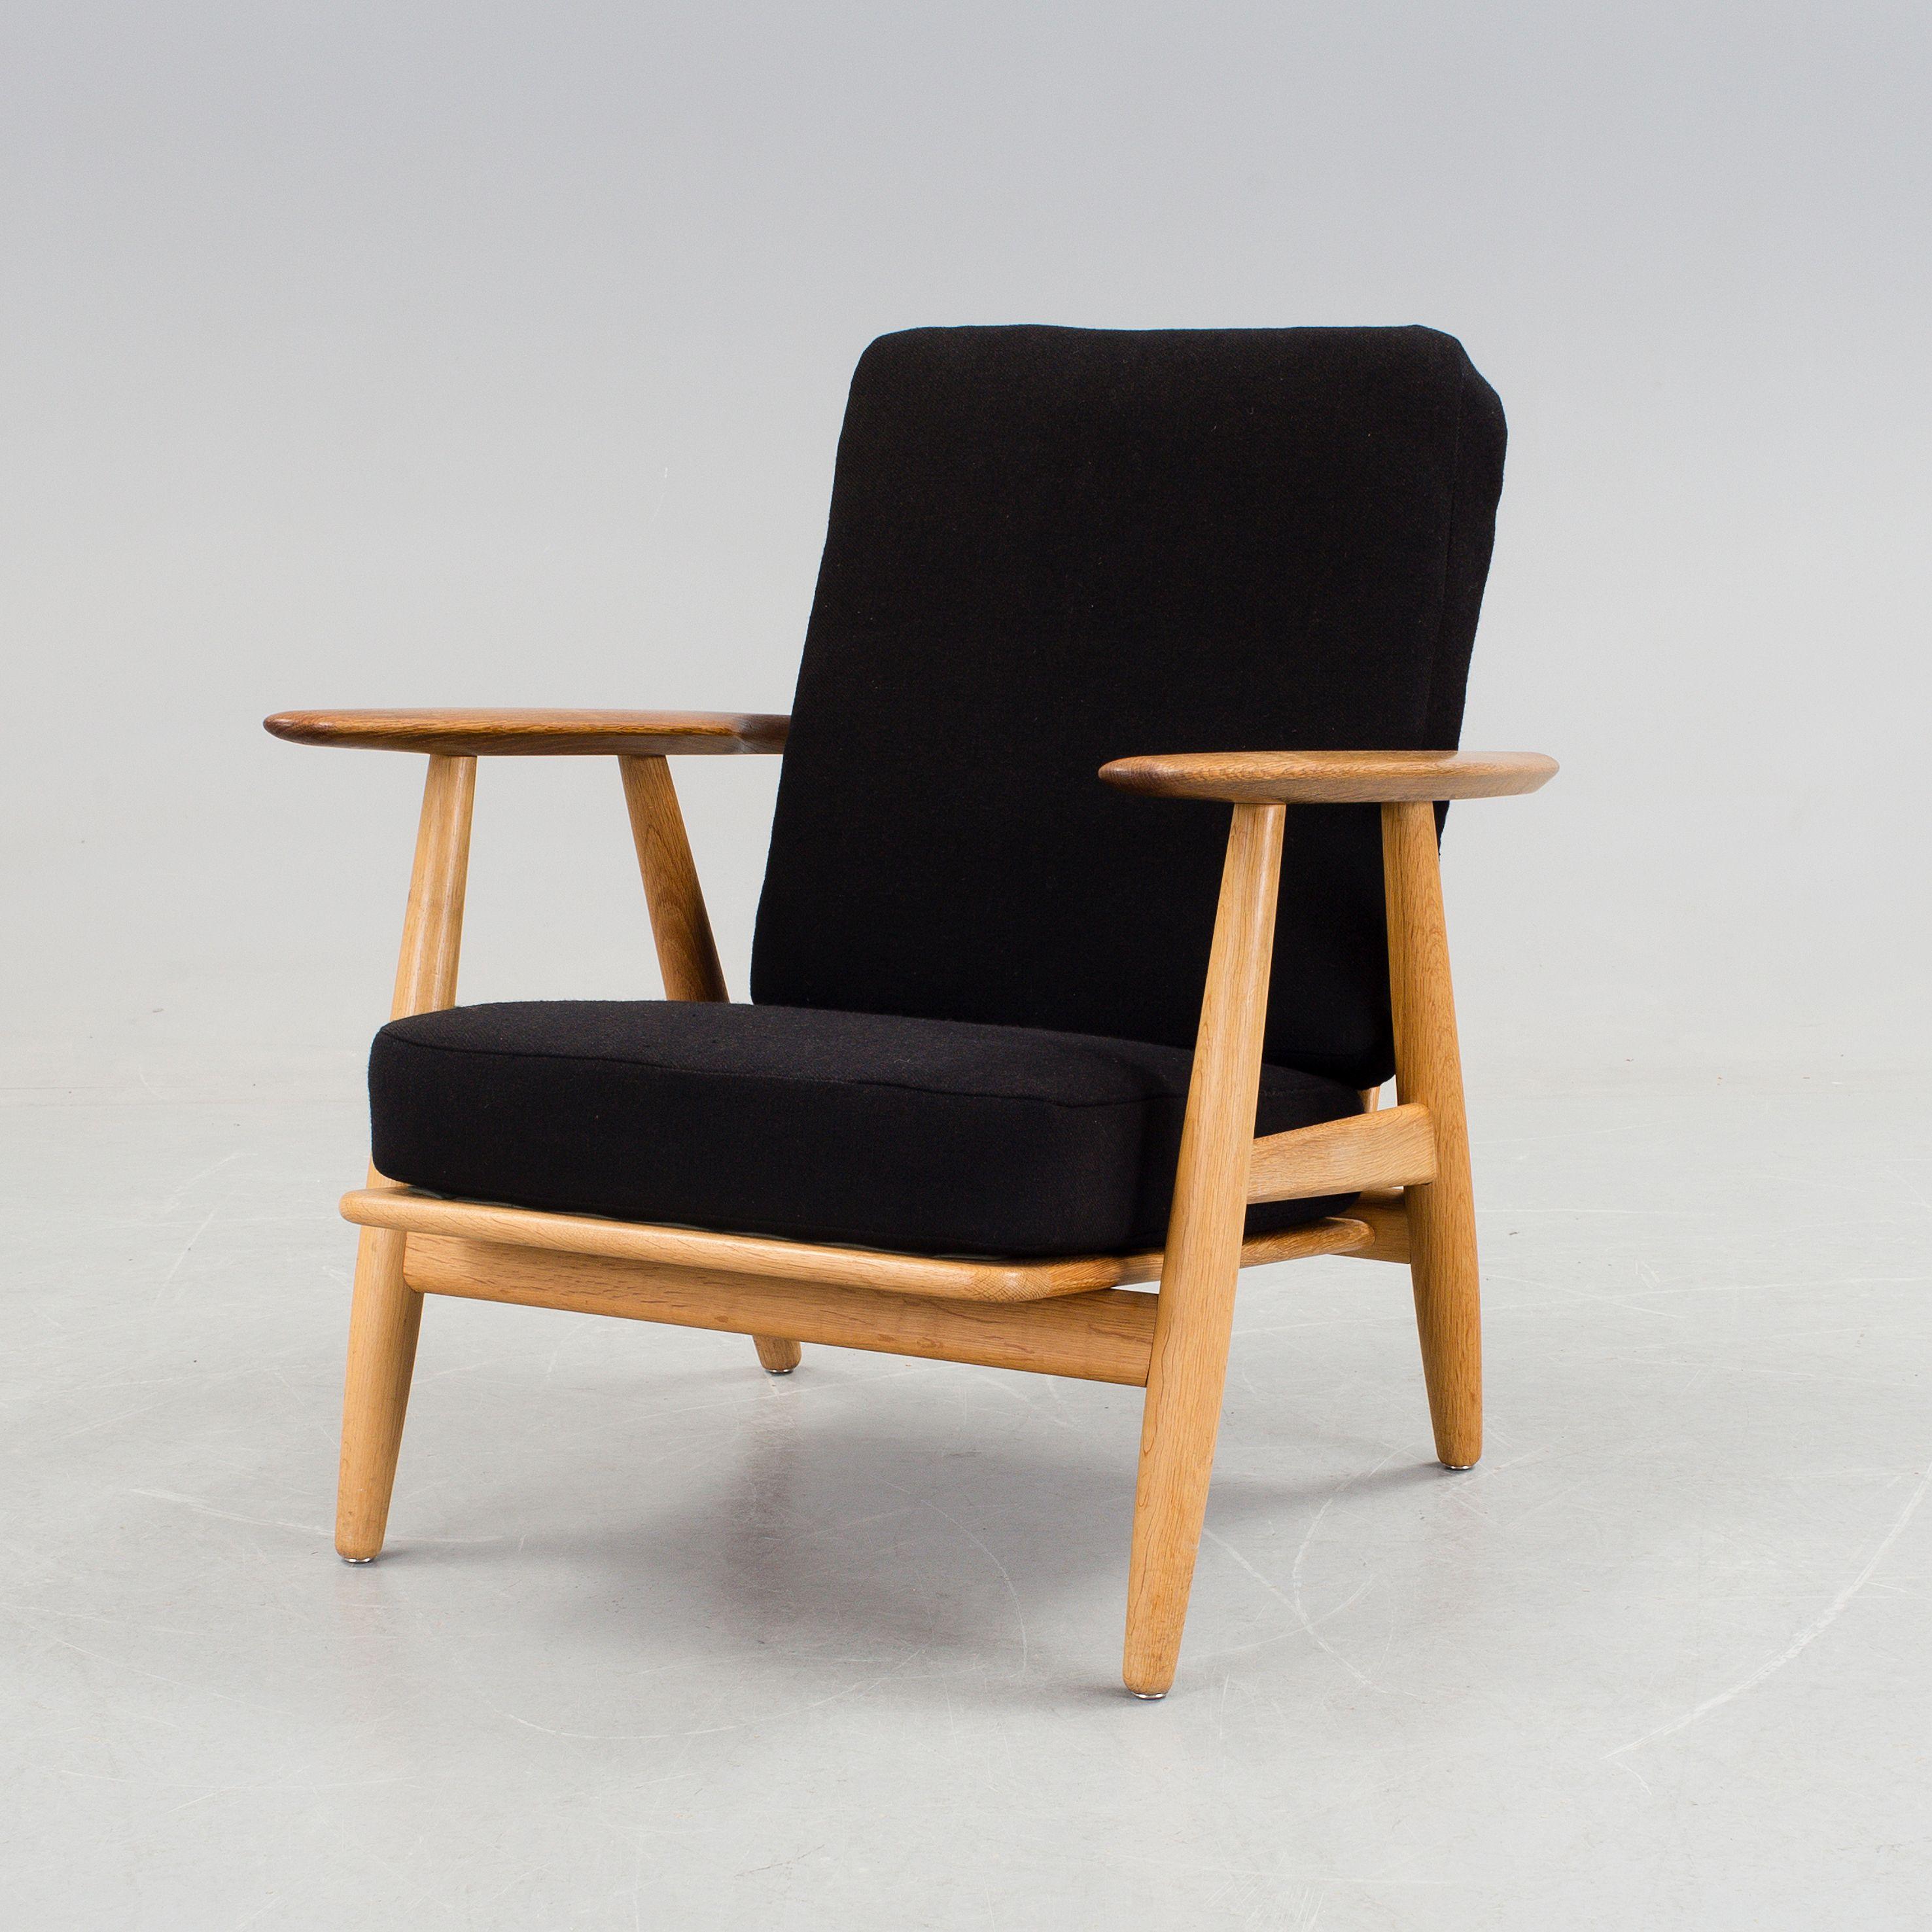 A vintage armchair GE 240 / Cigarren by Hans J Wegner